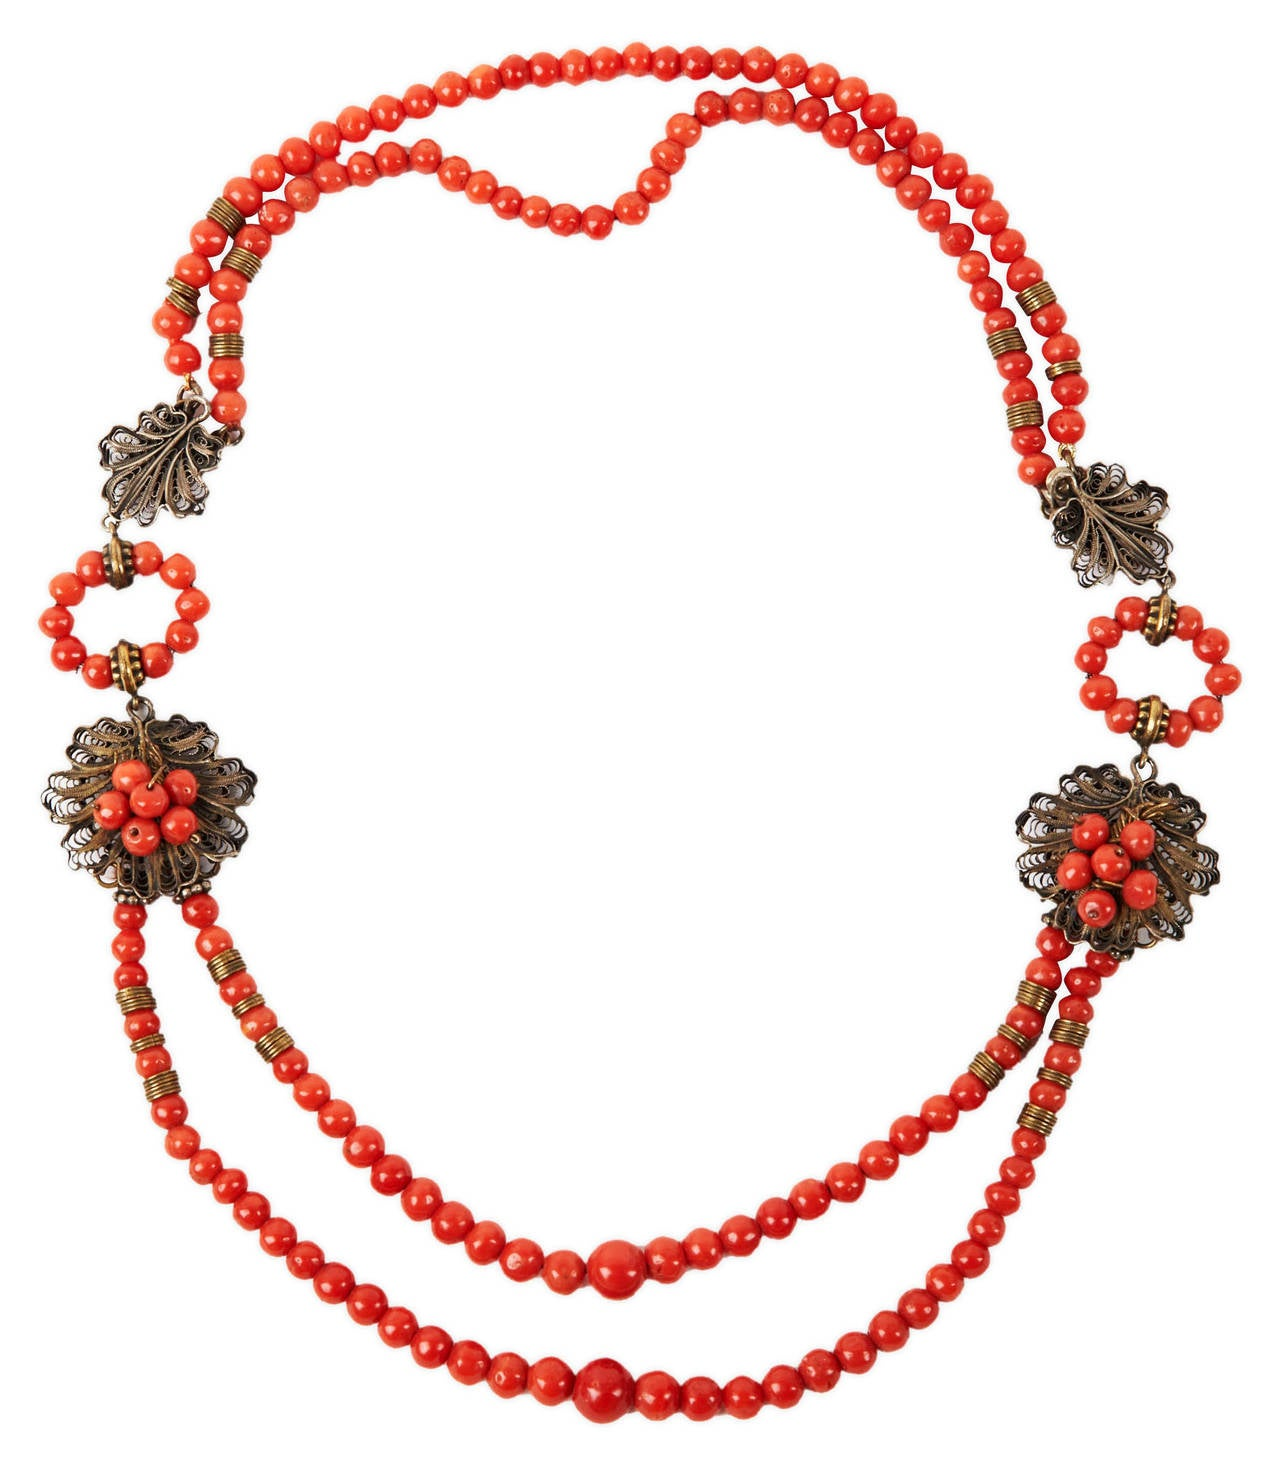 Antique Coral Filigree Necklace 2